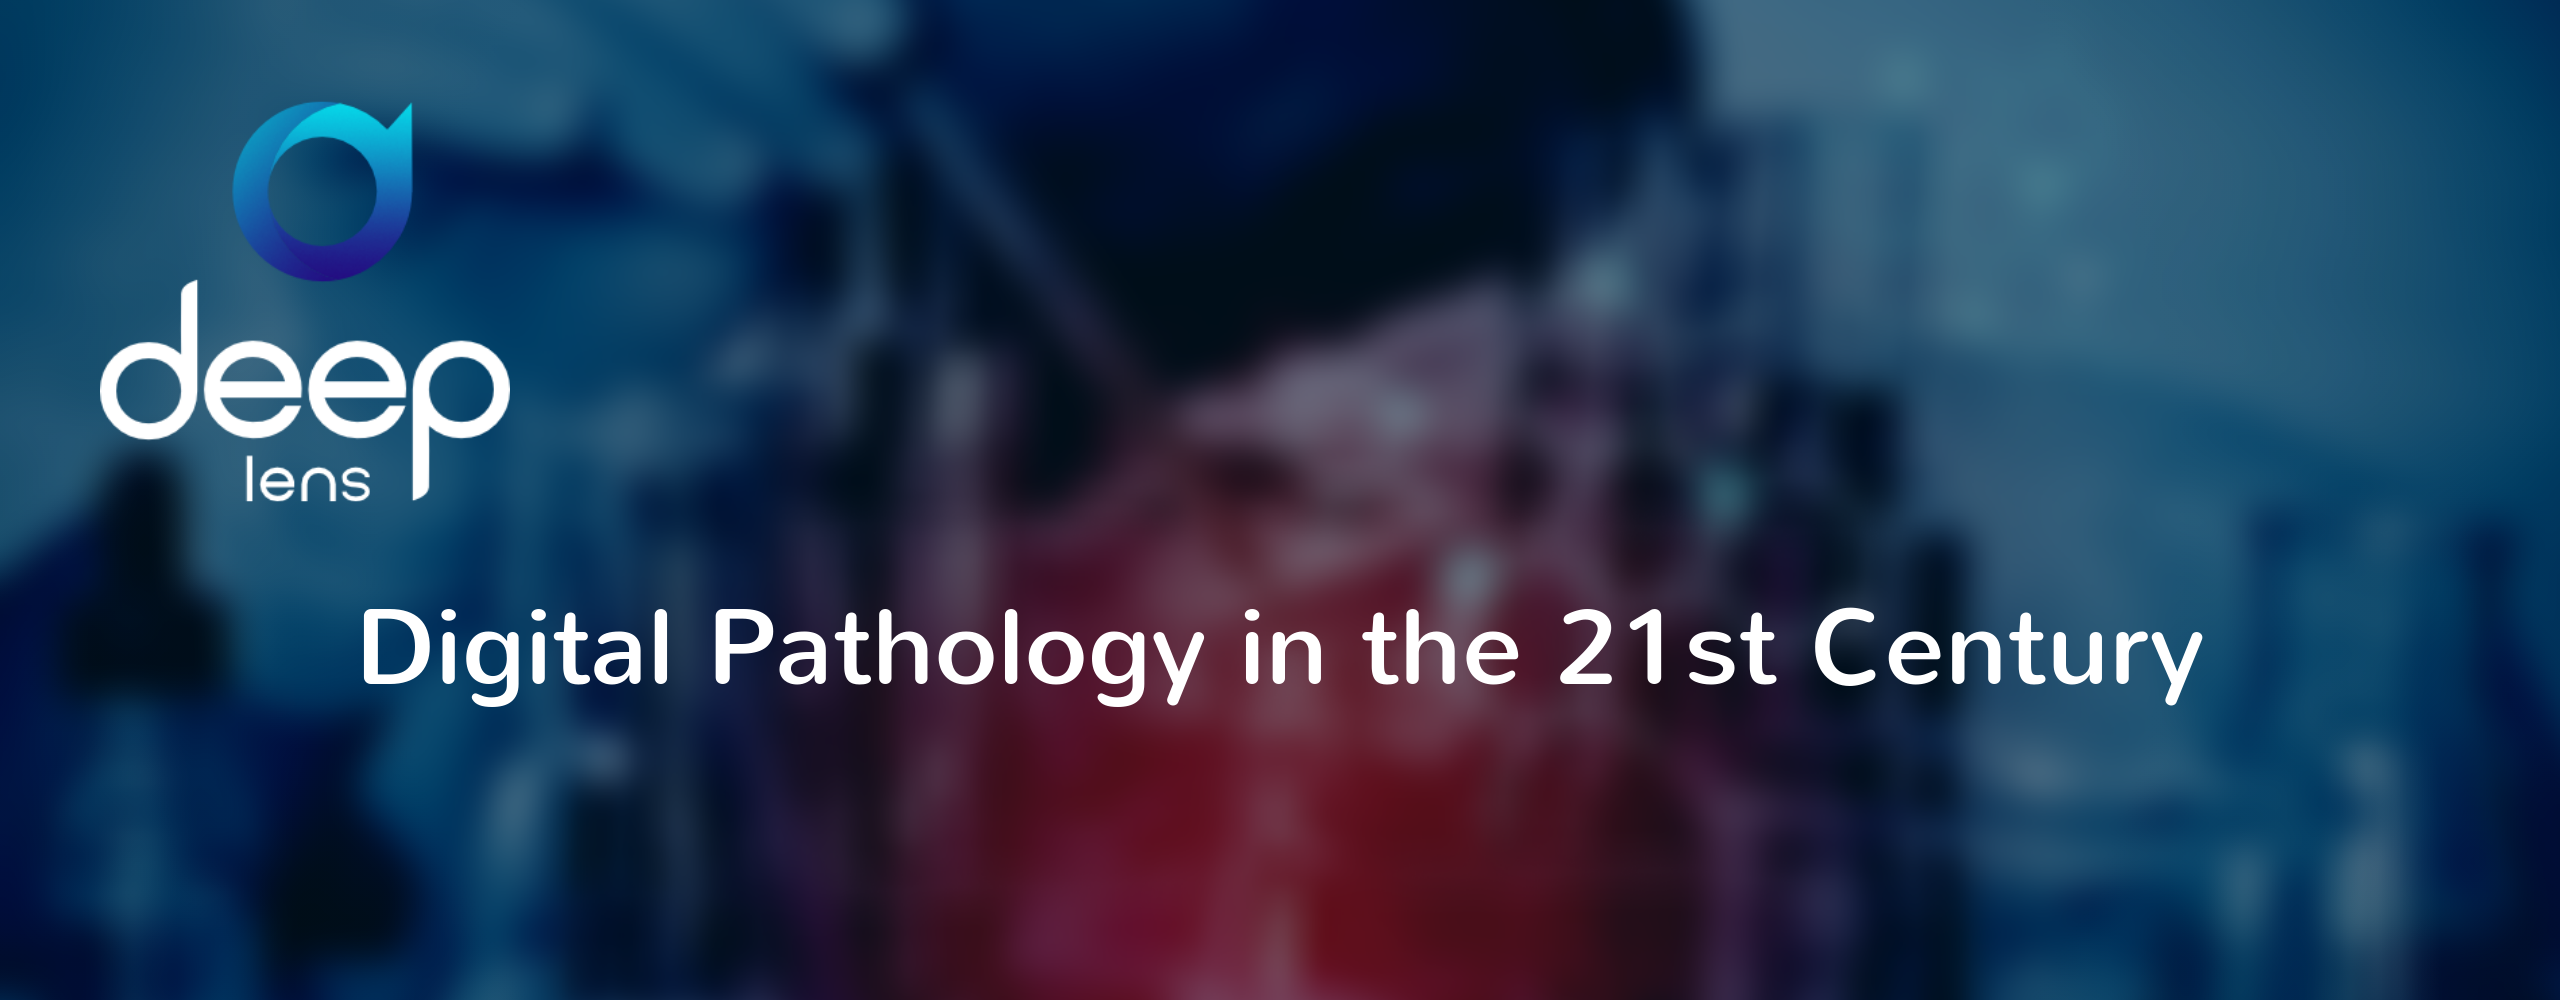 Copy of Deep Lens Digital Pathology Service 2560 _1000 (4)